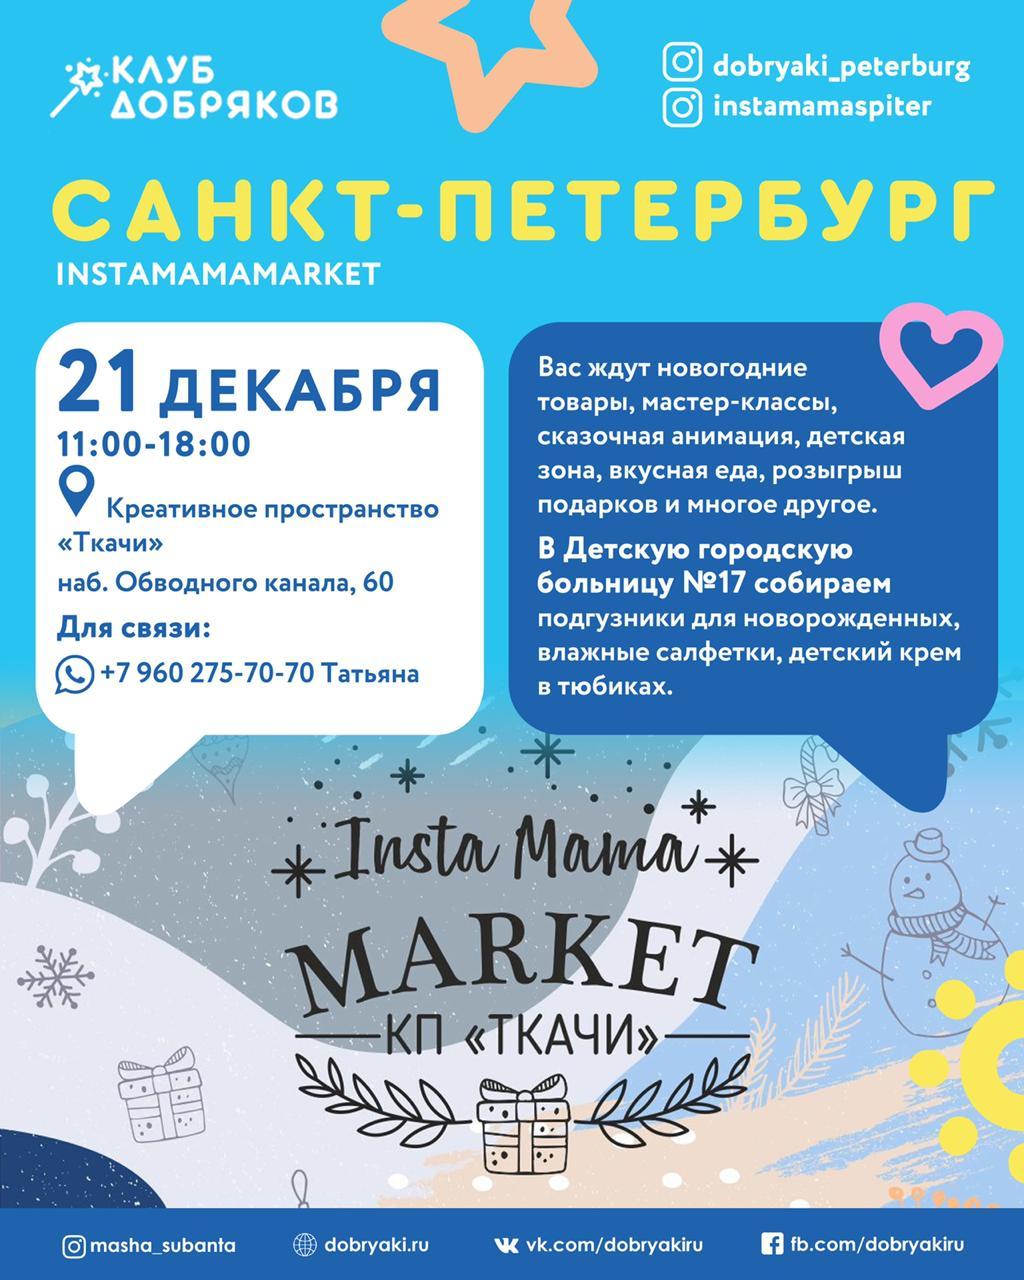 Добряки Санкт-Петербурга примут участие в «Инста-мама маркете»